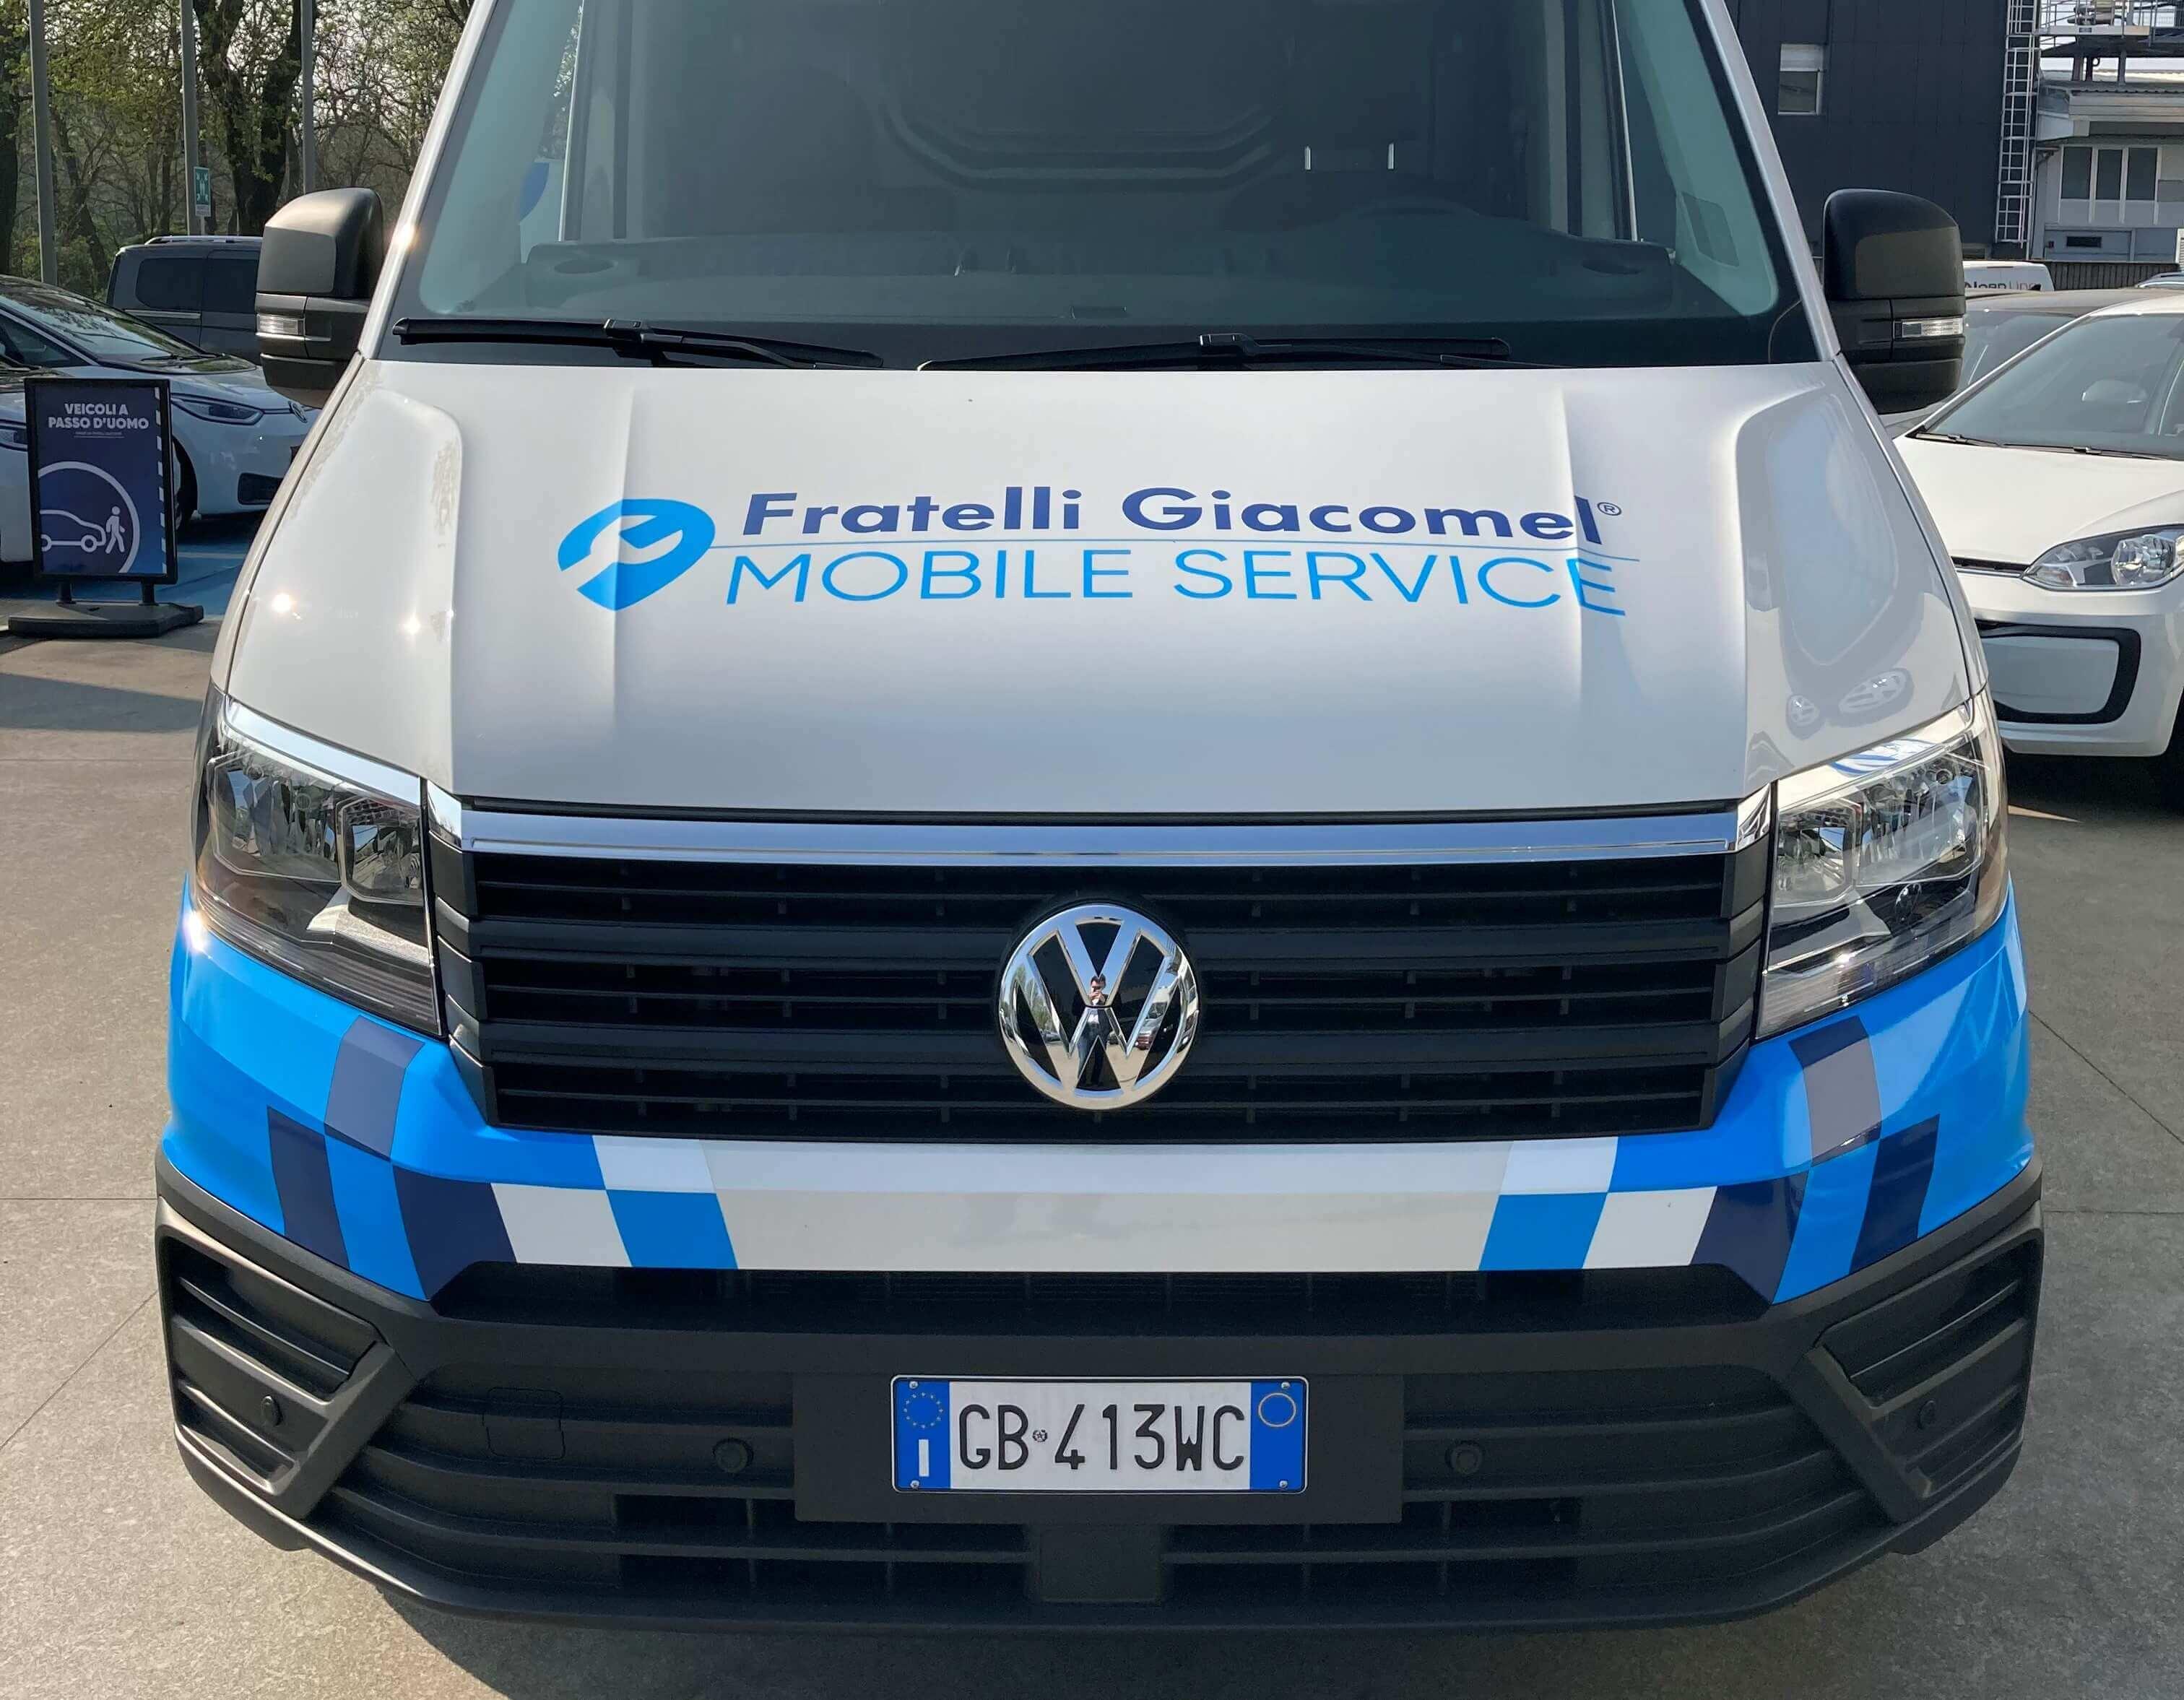 MSU - Mobile Servie Unit - Officina Mobile